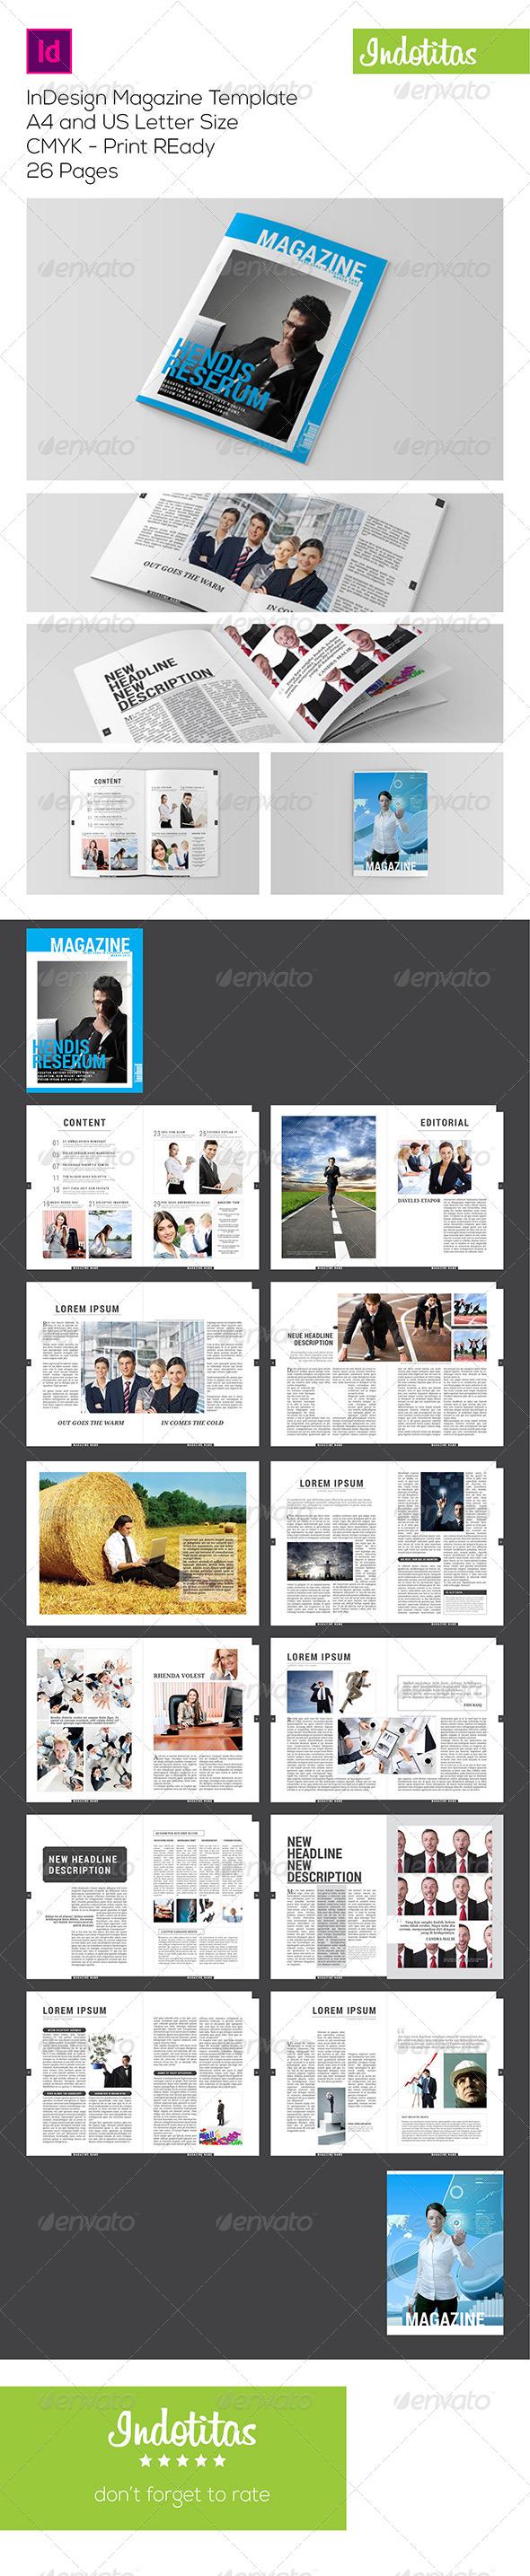 GraphicRiver InDesign Magazine Template 7153186